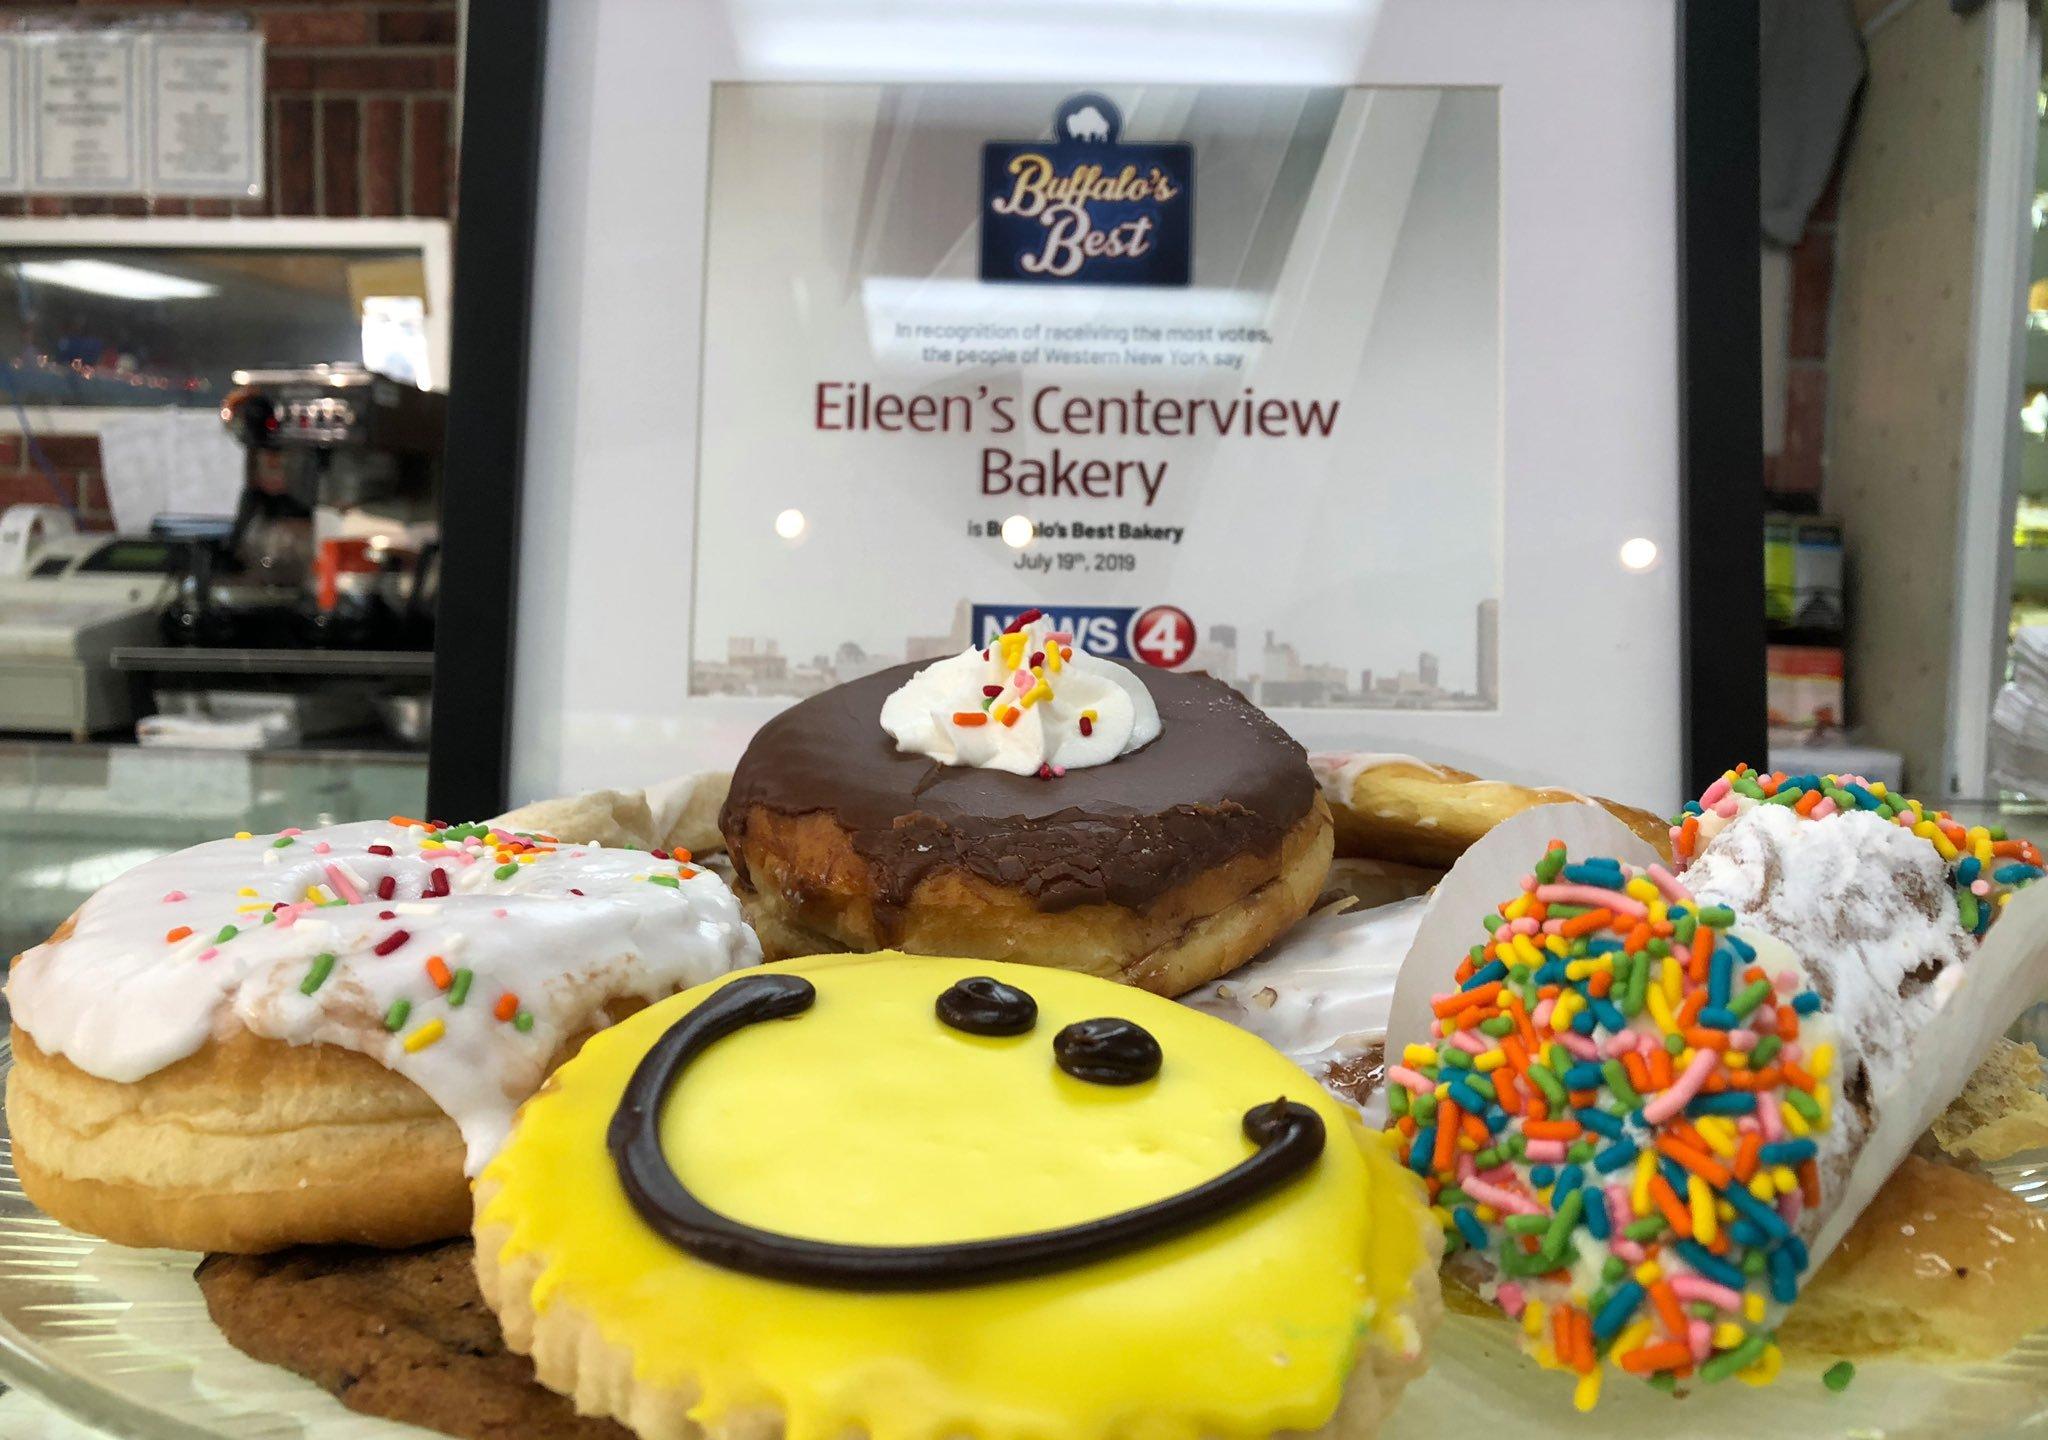 Groovy Buffalos Best Bakery Eileens Centerview Bakery News 4 Buffalo Funny Birthday Cards Online Necthendildamsfinfo